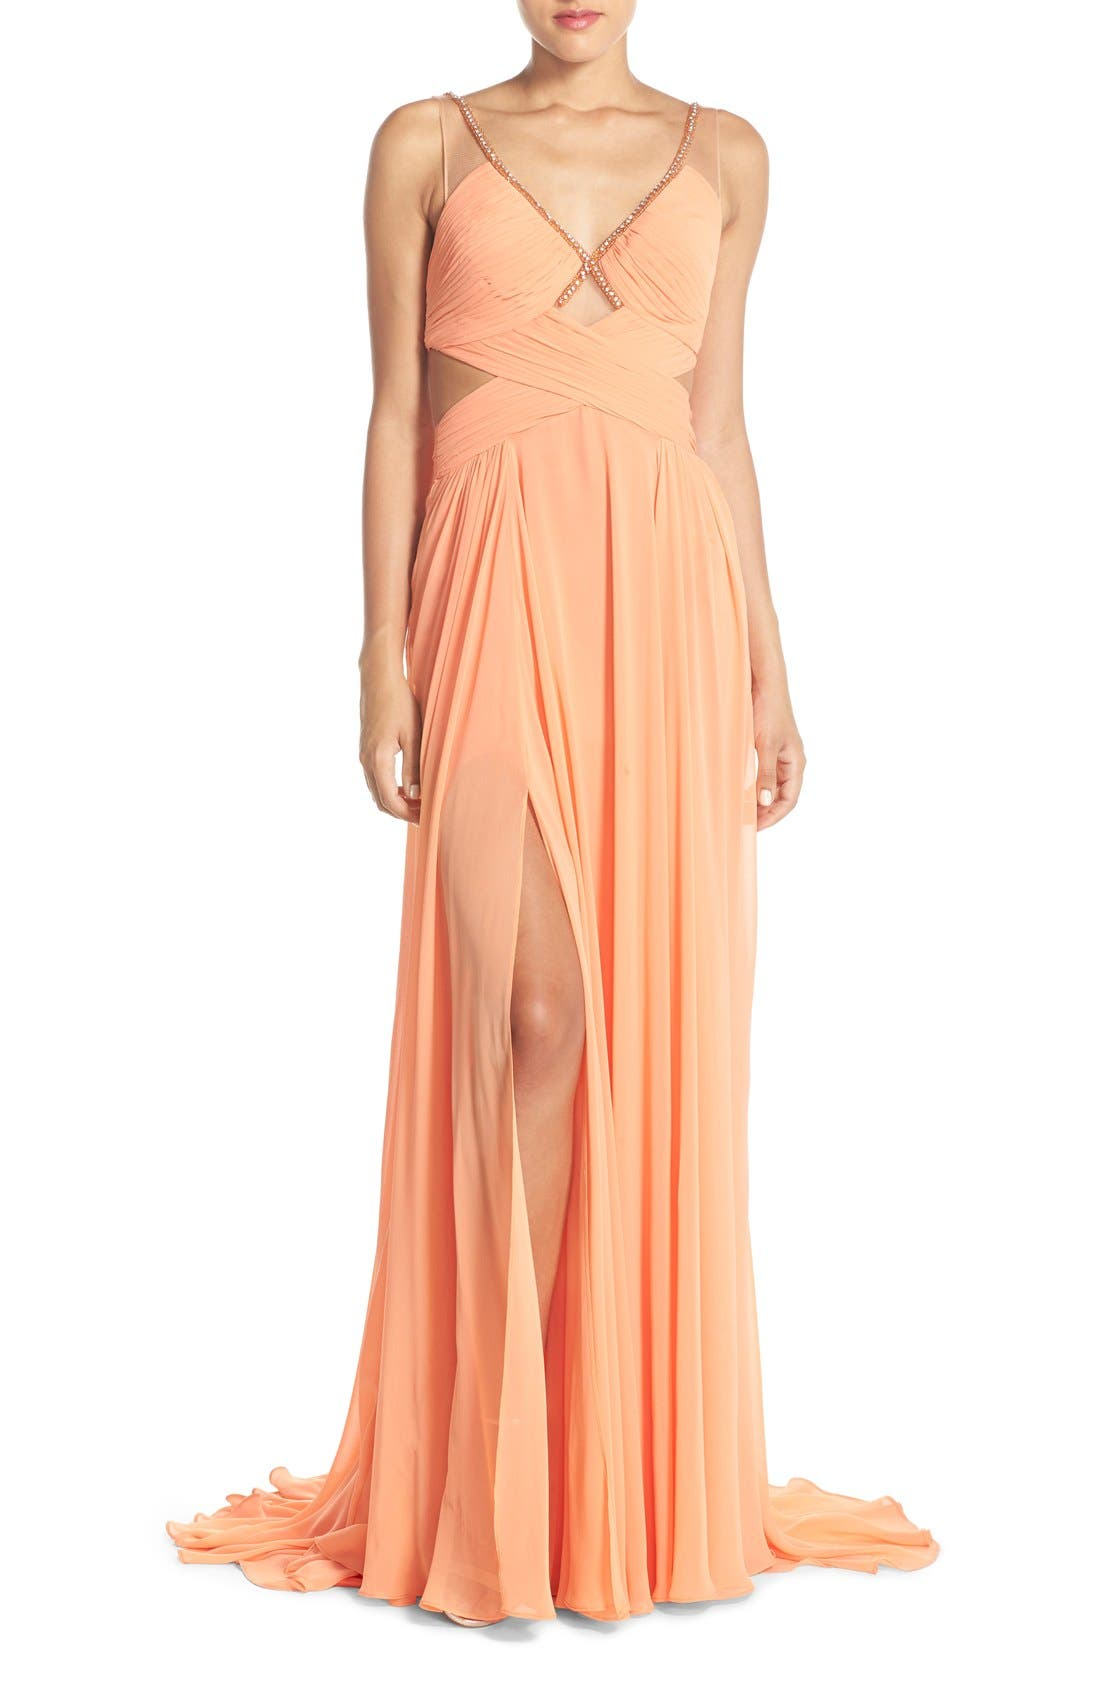 Main Image - Terani Couture Cutout Embellished Chiffon Gown